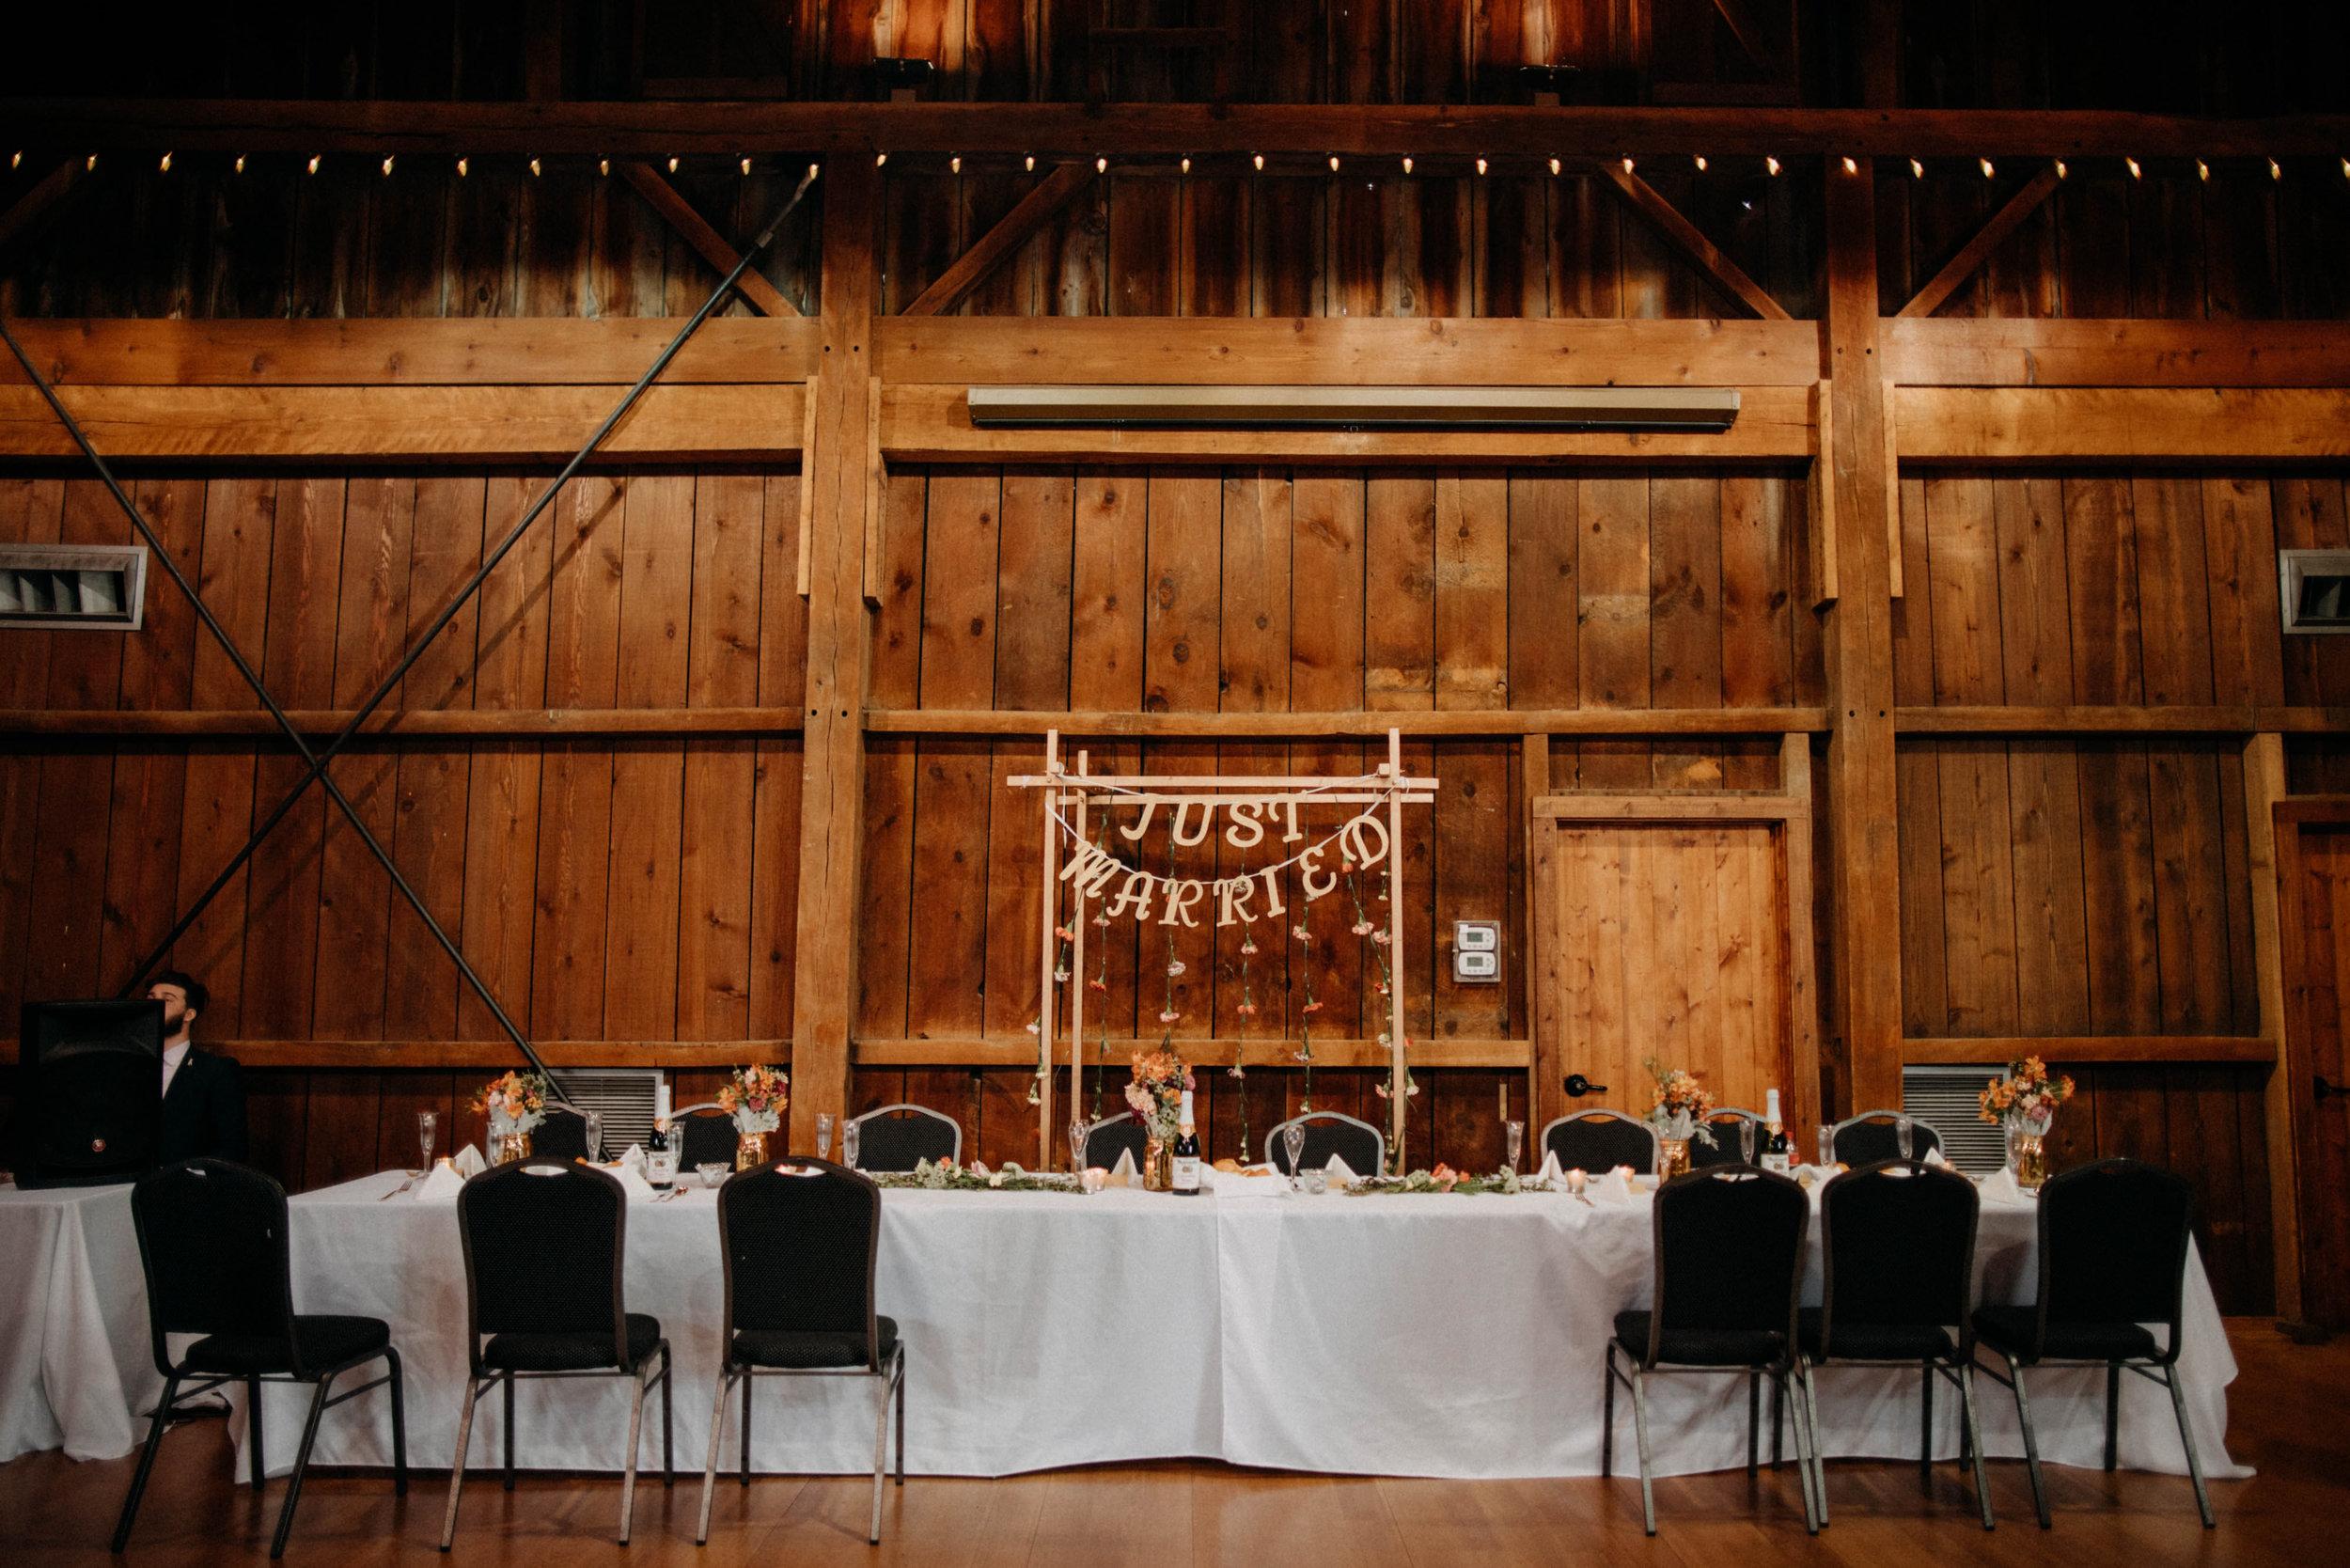 Columbus, Ohio Wedding Photographer Everal Barn At Heritage Park Wedding Venue Grace E Jones Photography205.jpg